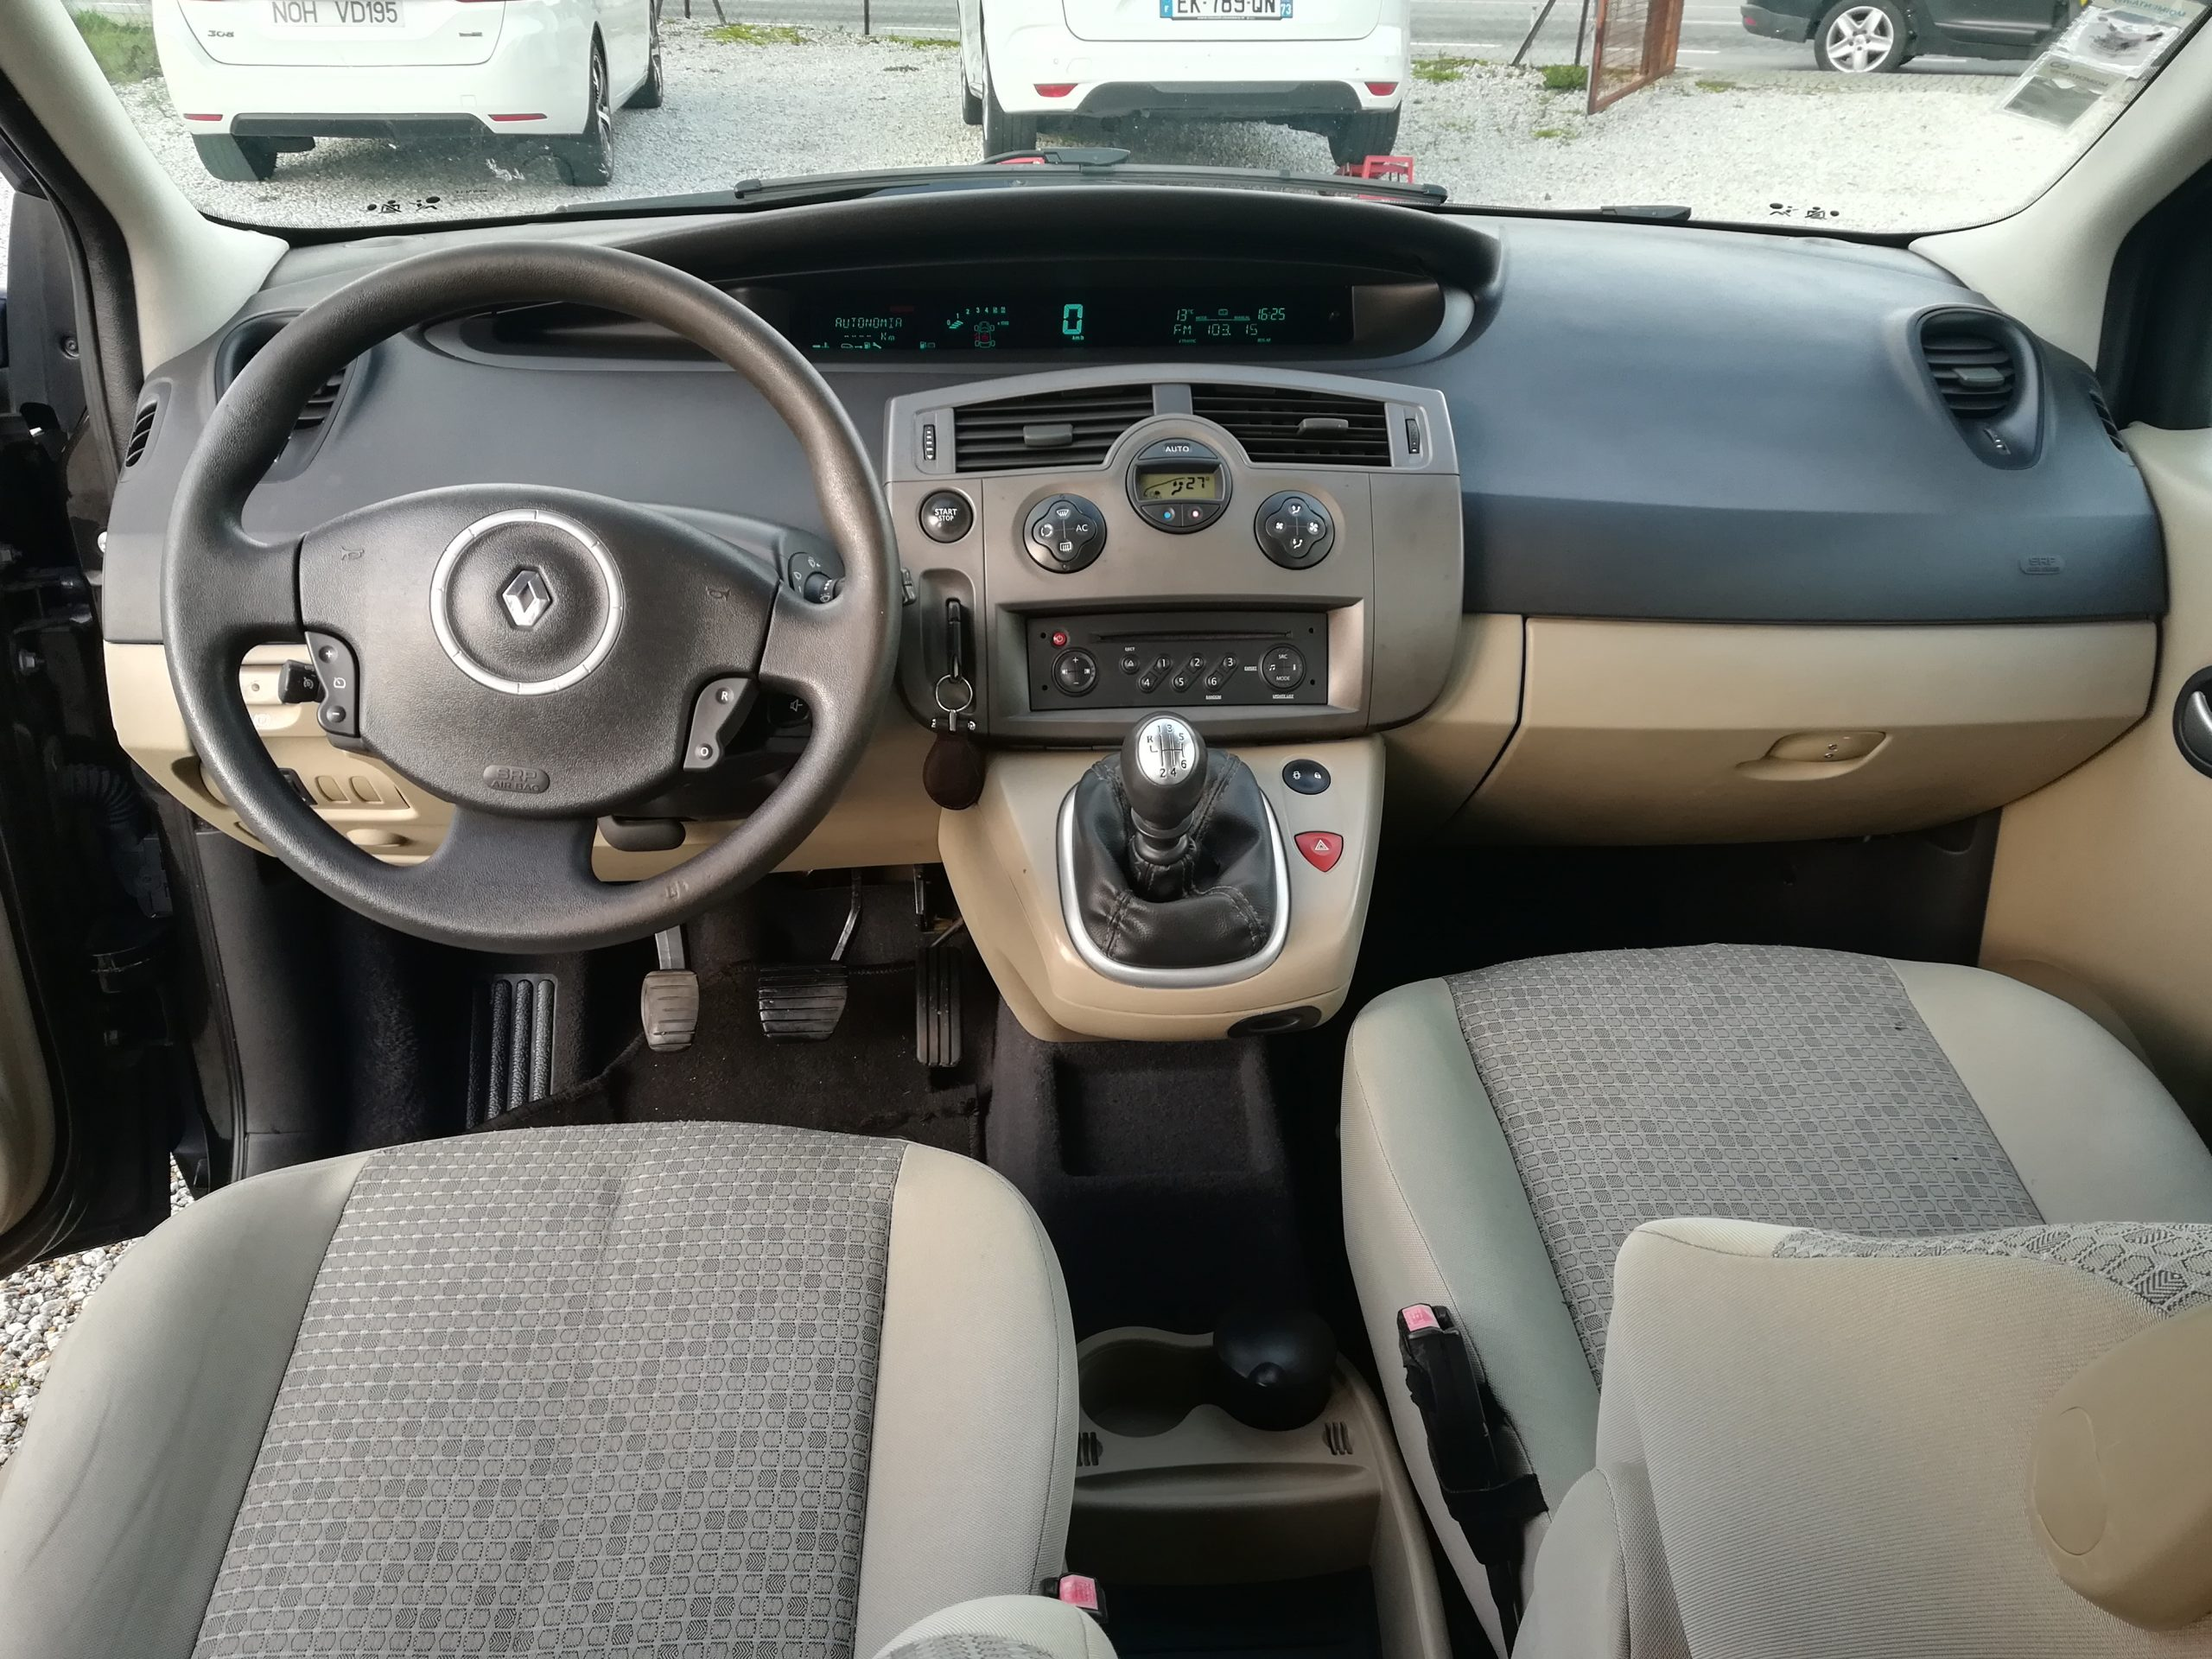 Renault senic 1.5 7 lugares